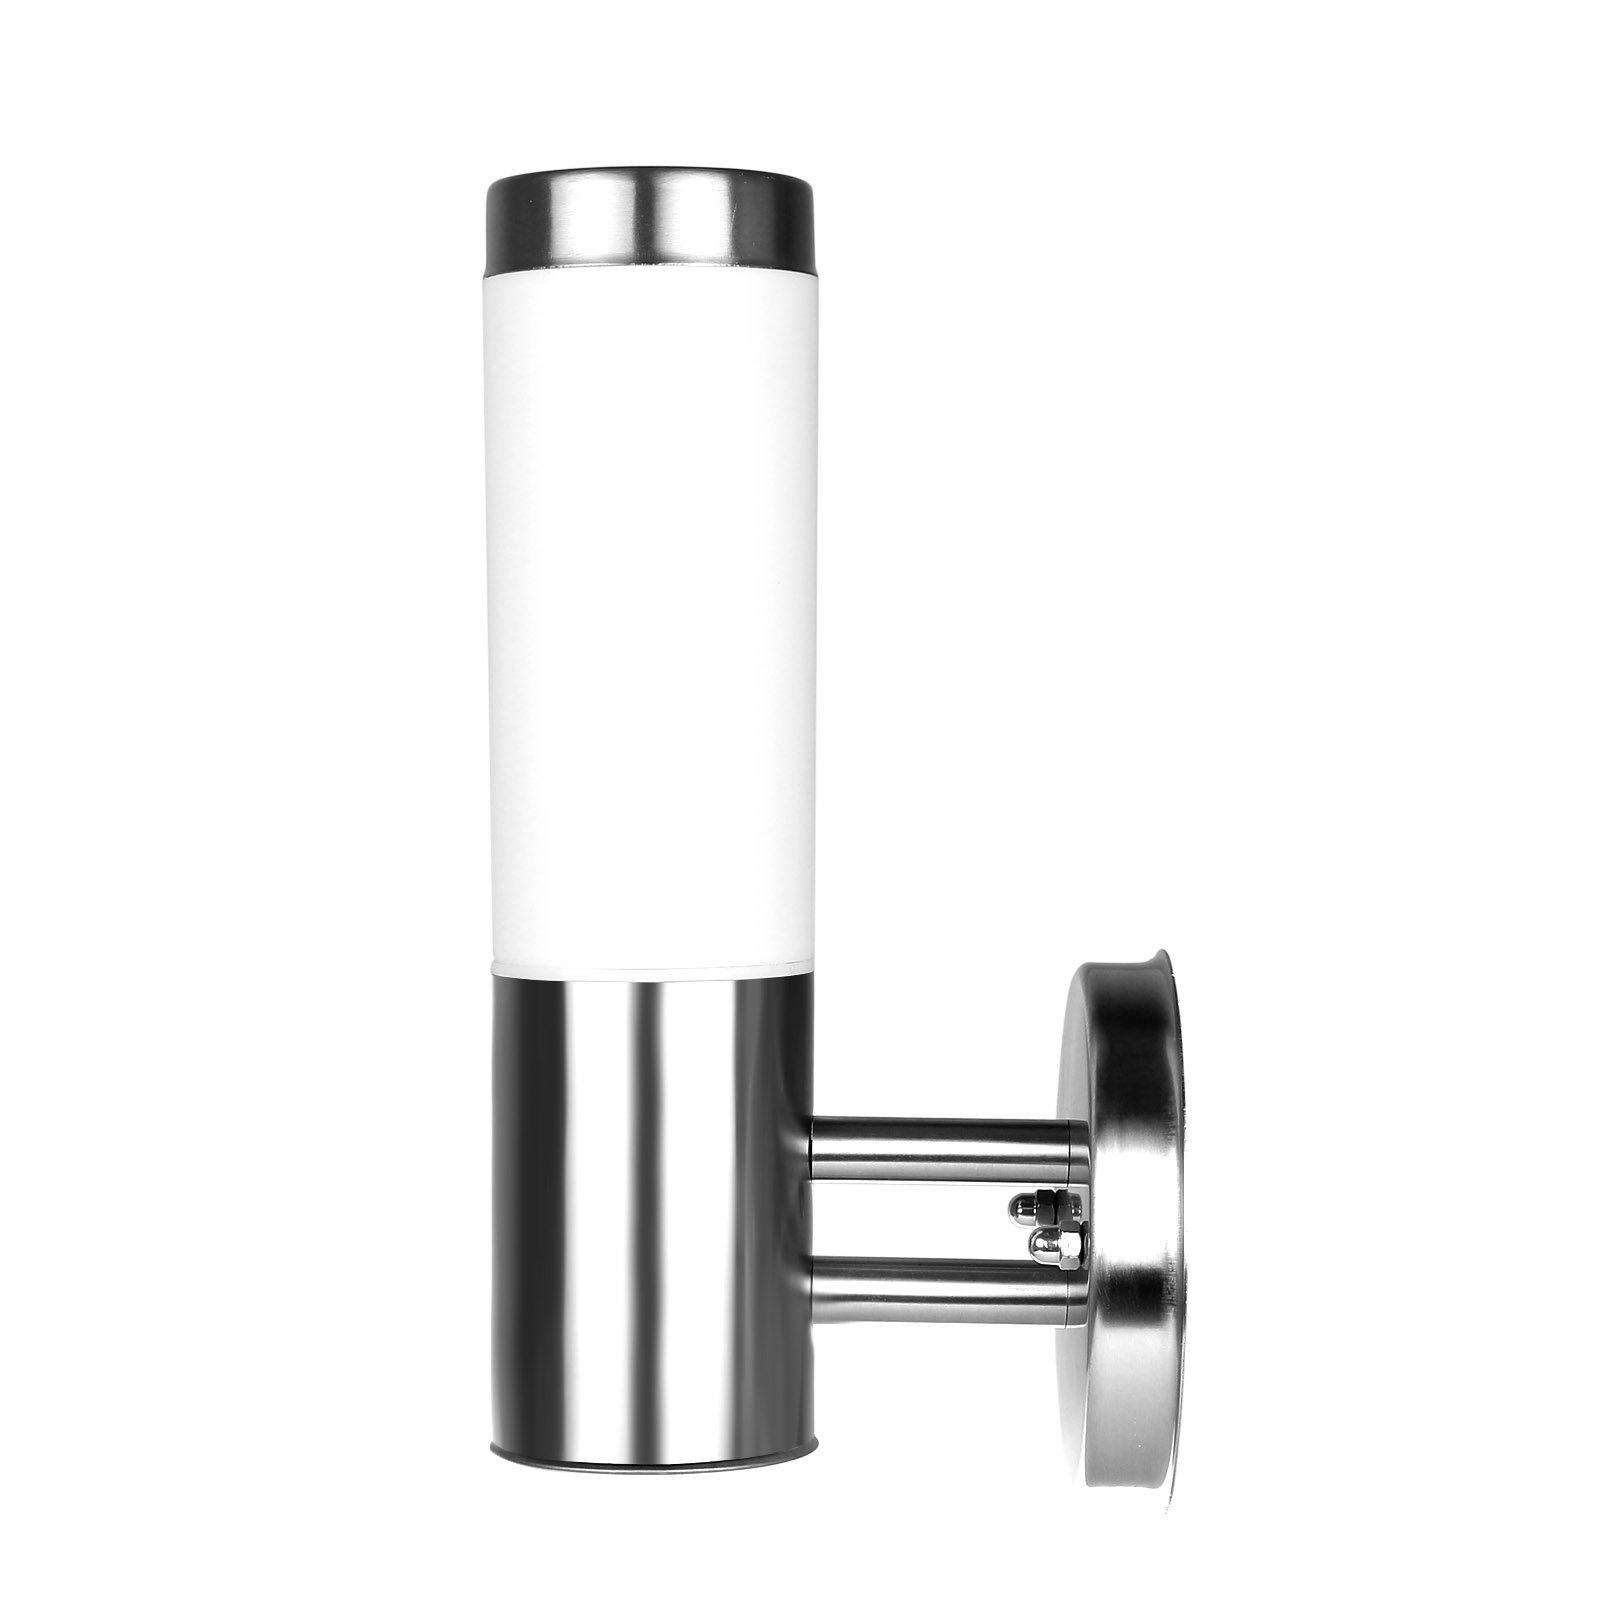 Powstro 5W E27 LED-Bulb-Replaceable Wall Light Fixture Waterproof Stainless Steel Outdoor Indoor Modern Candle Lamp Light for Bedroom,Bathroom,Door,Garden(Warm white)